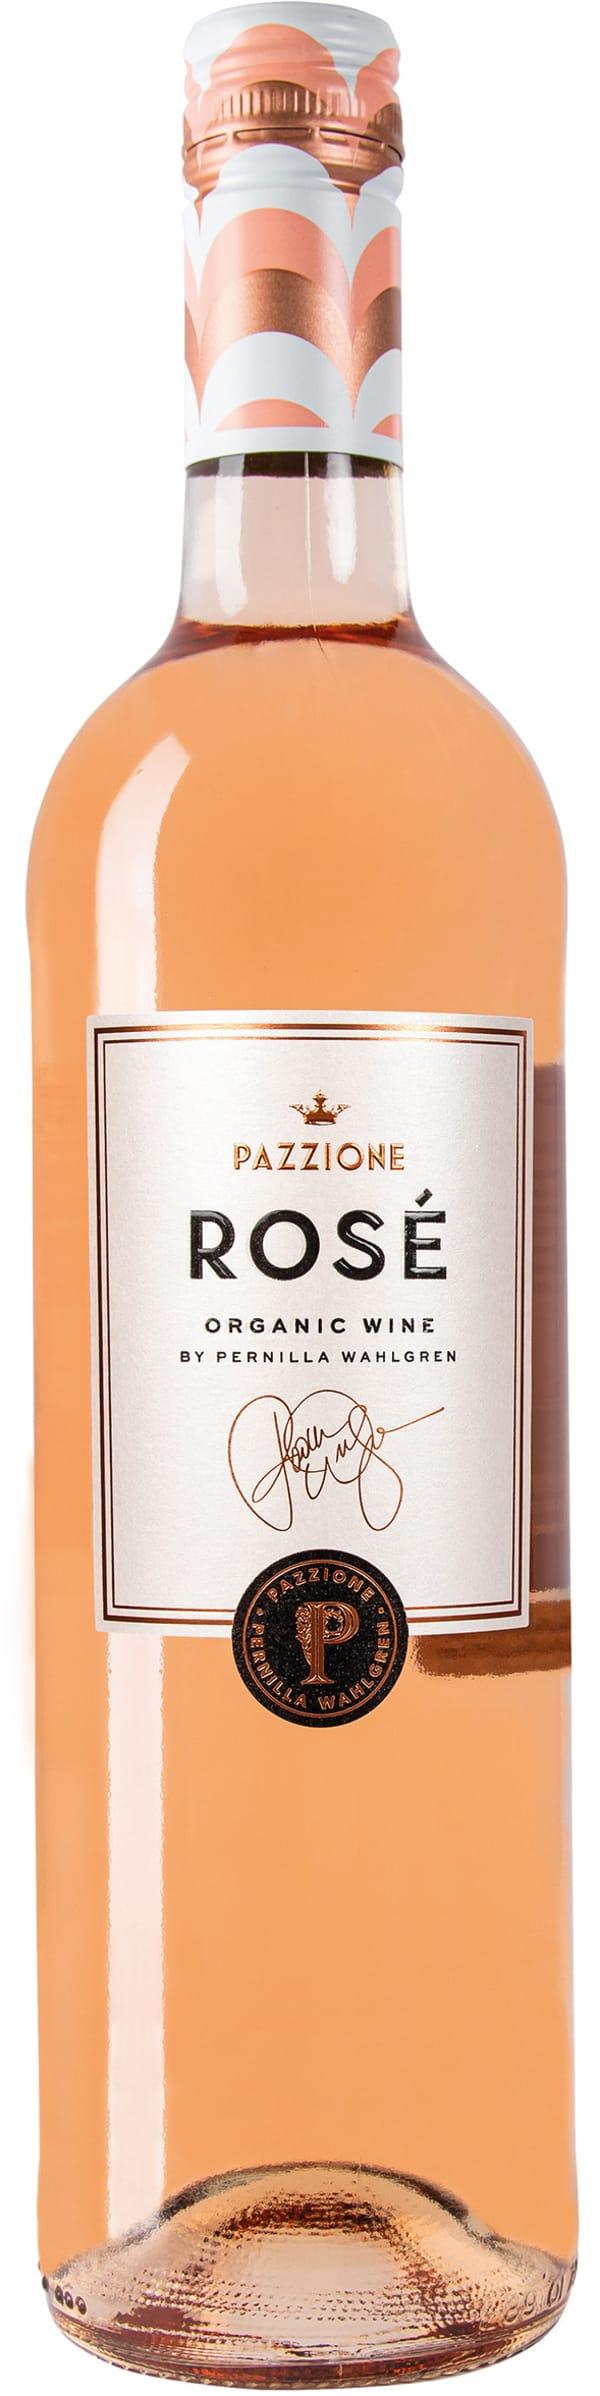 Pazzione Rose by Pernilla Wahlgren 2020